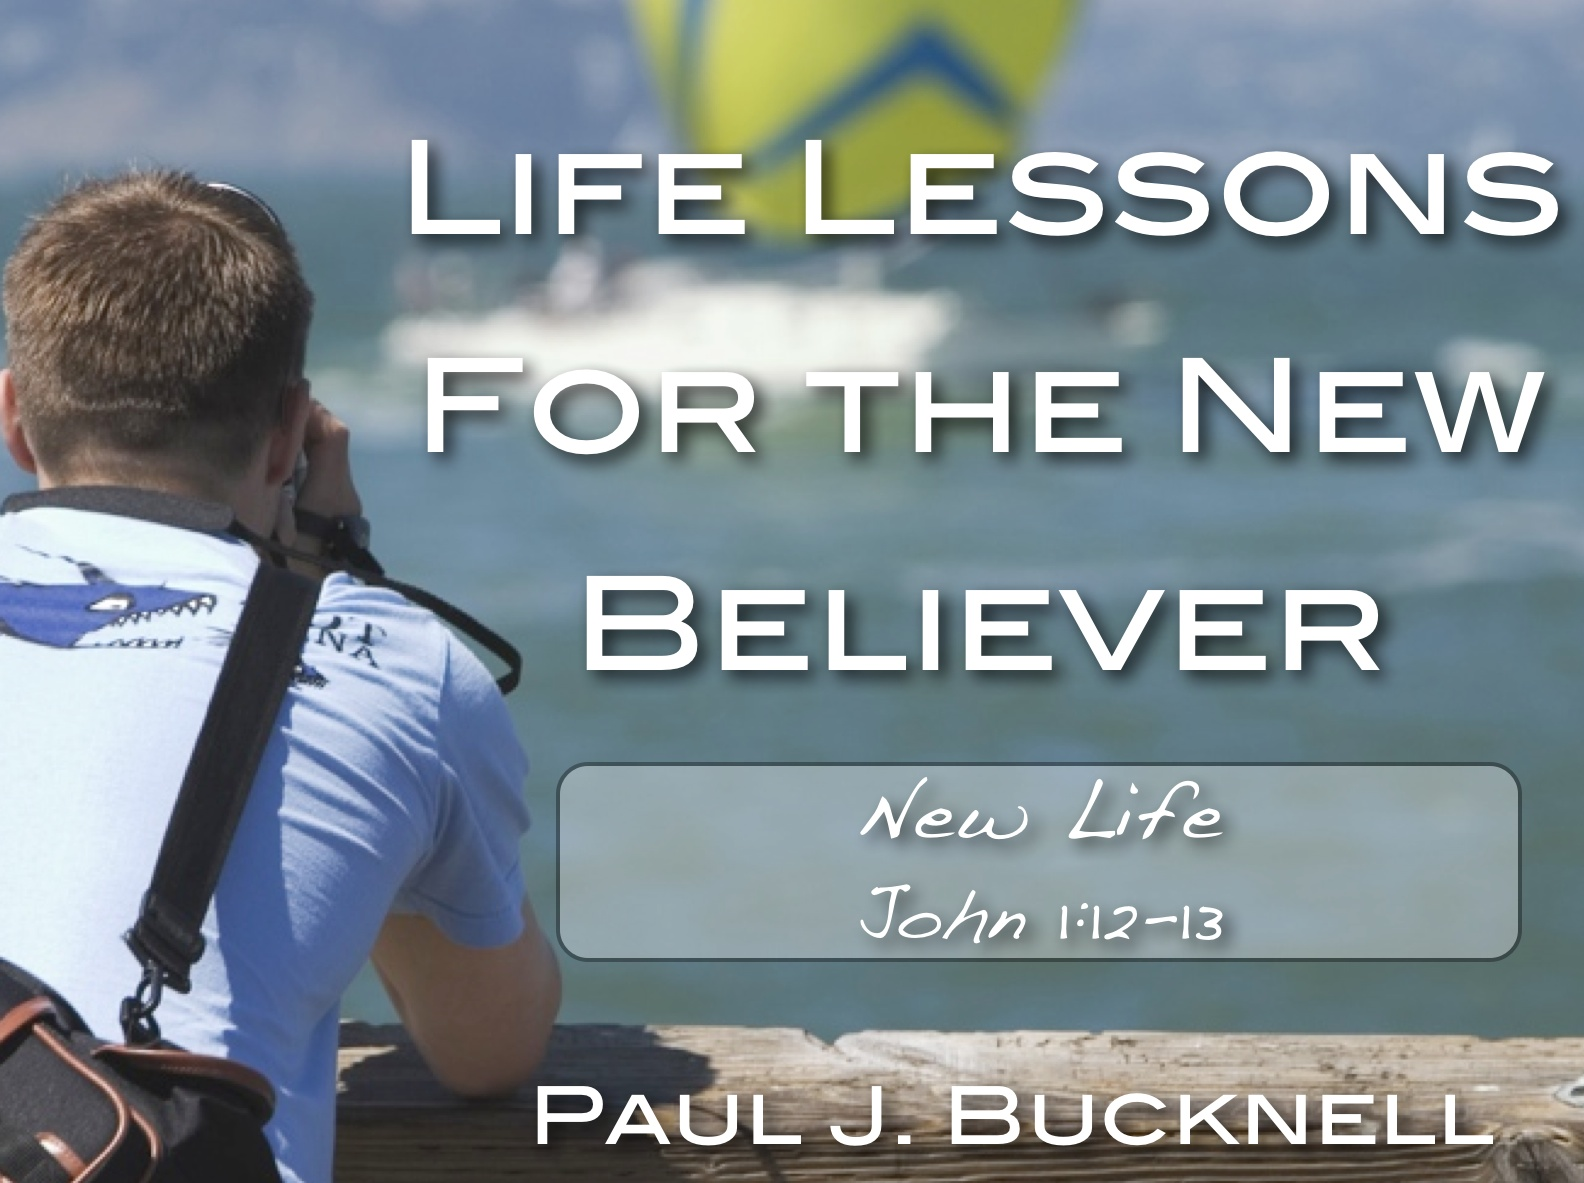 New Life - John 1:12-13 | Part of the Life Discipleship Lessons ...